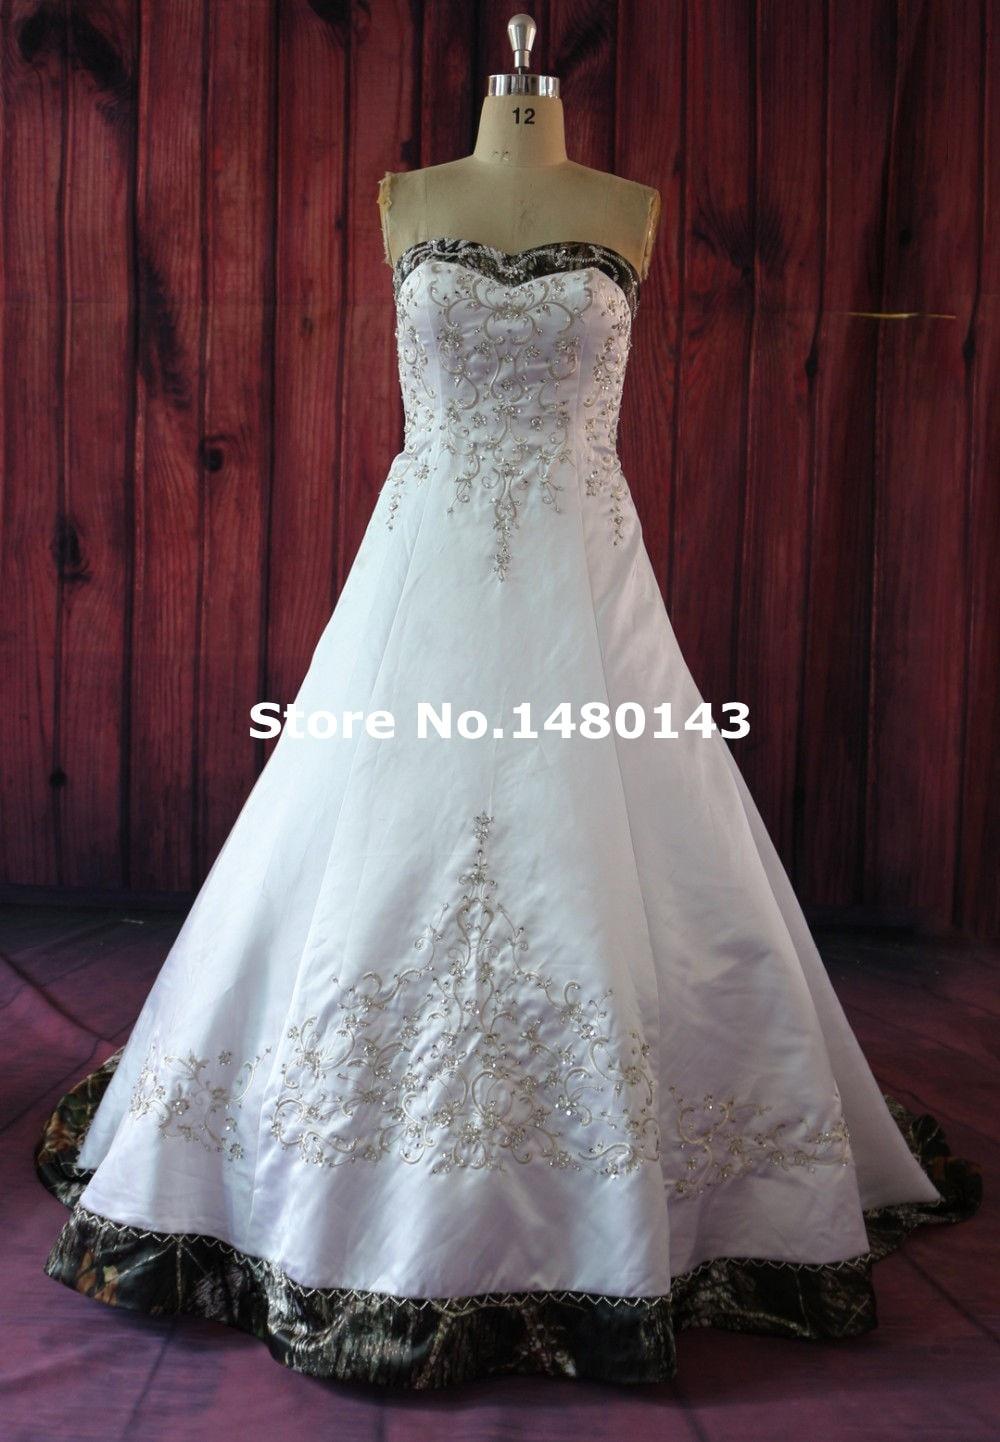 camo wedding dresses camouflage wedding dresses Wedding Dresses Inspiring Camo Wedding Dresses Inspirations camo wedding dresses